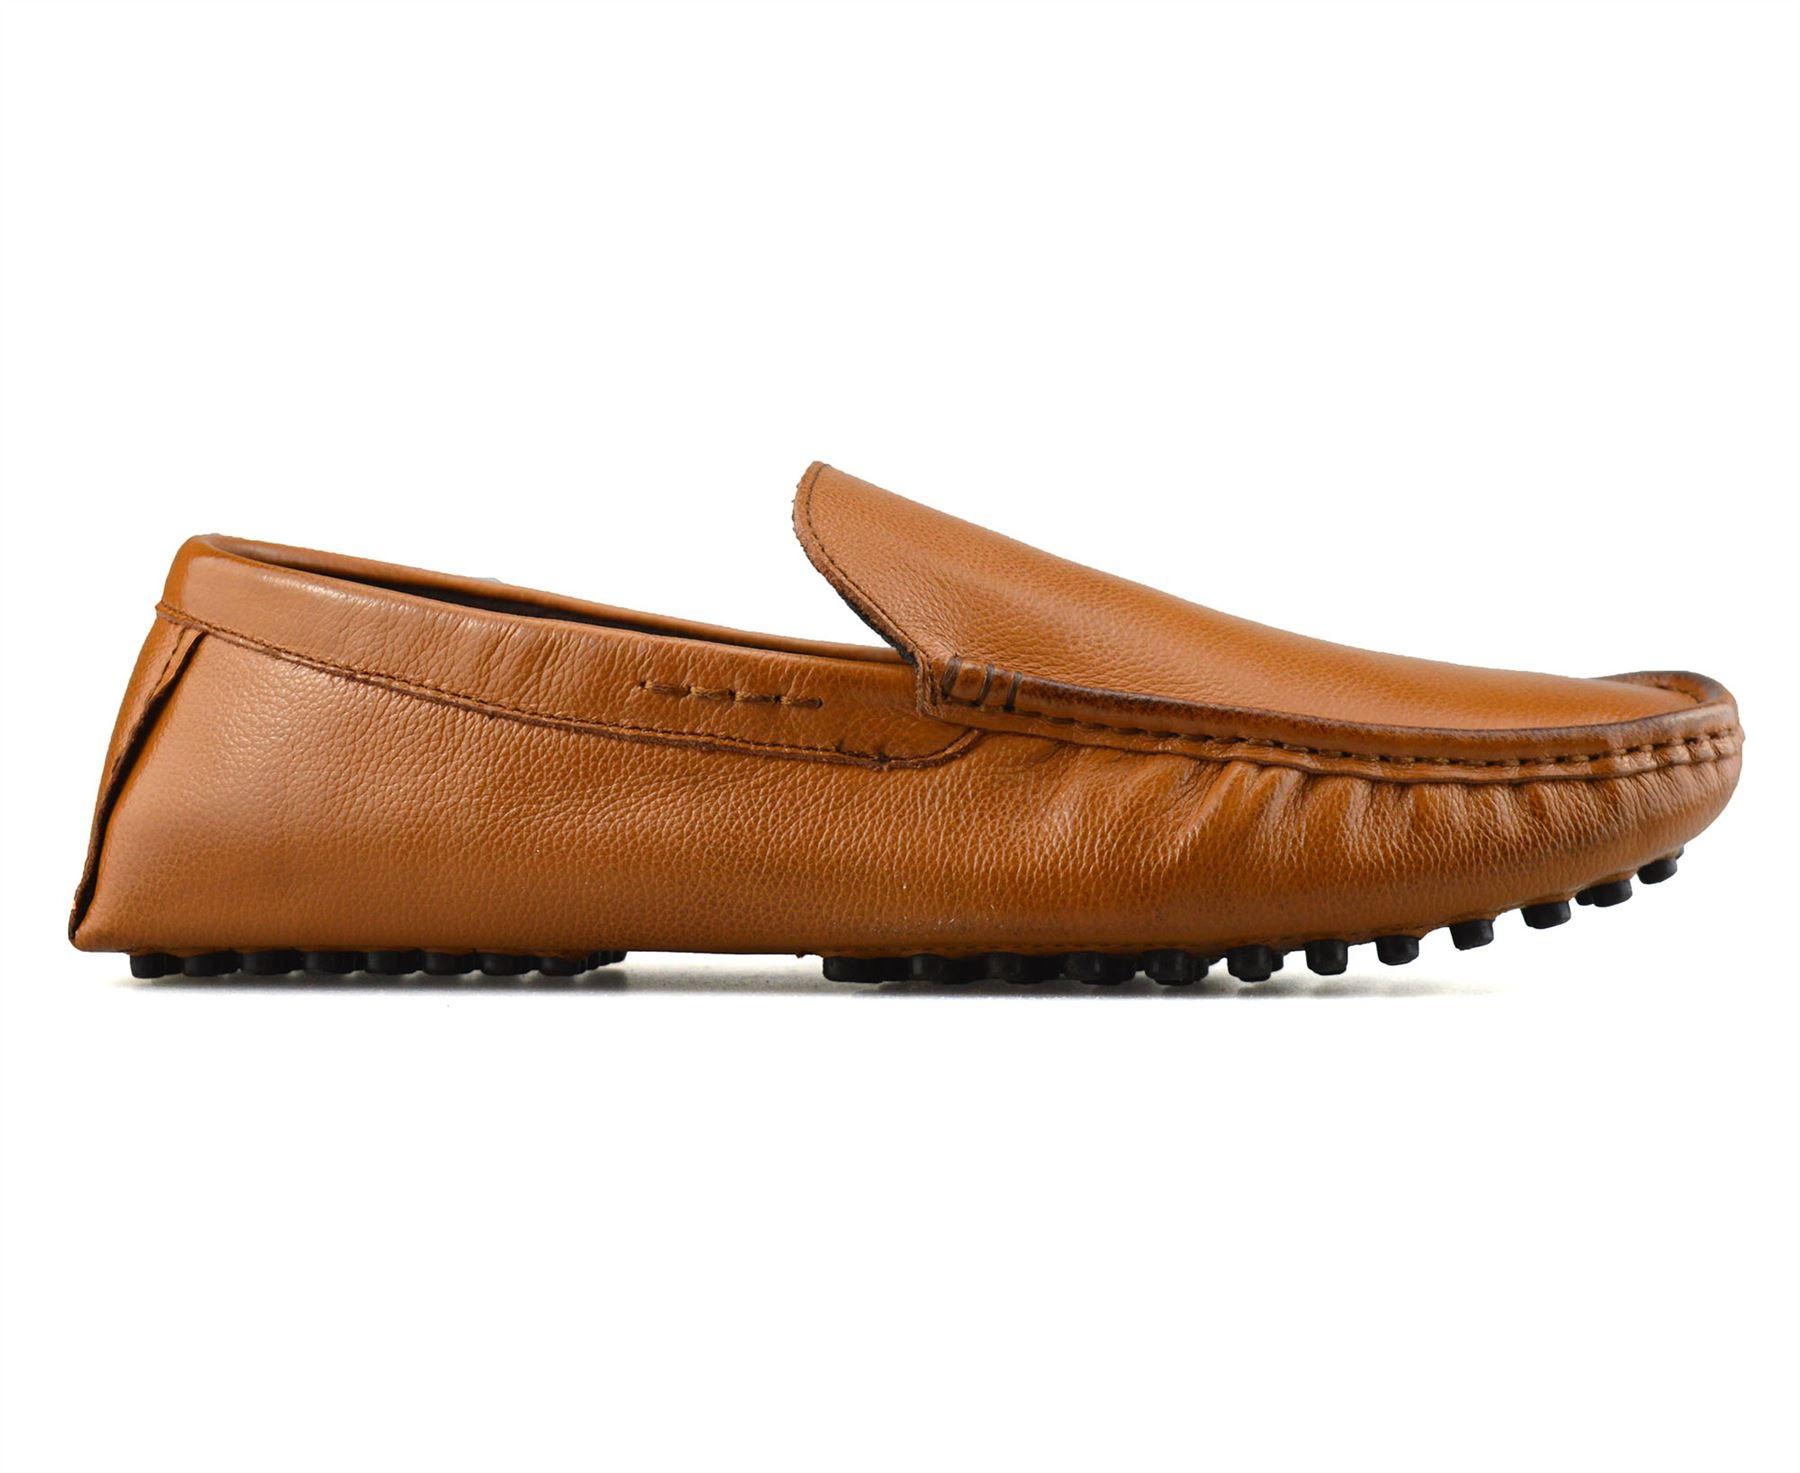 Homme-en-Cuir-Slip-On-Casual-Smart-Mocassins-Mocassin-Homme-Conduite-Chaussures-Taille miniature 11